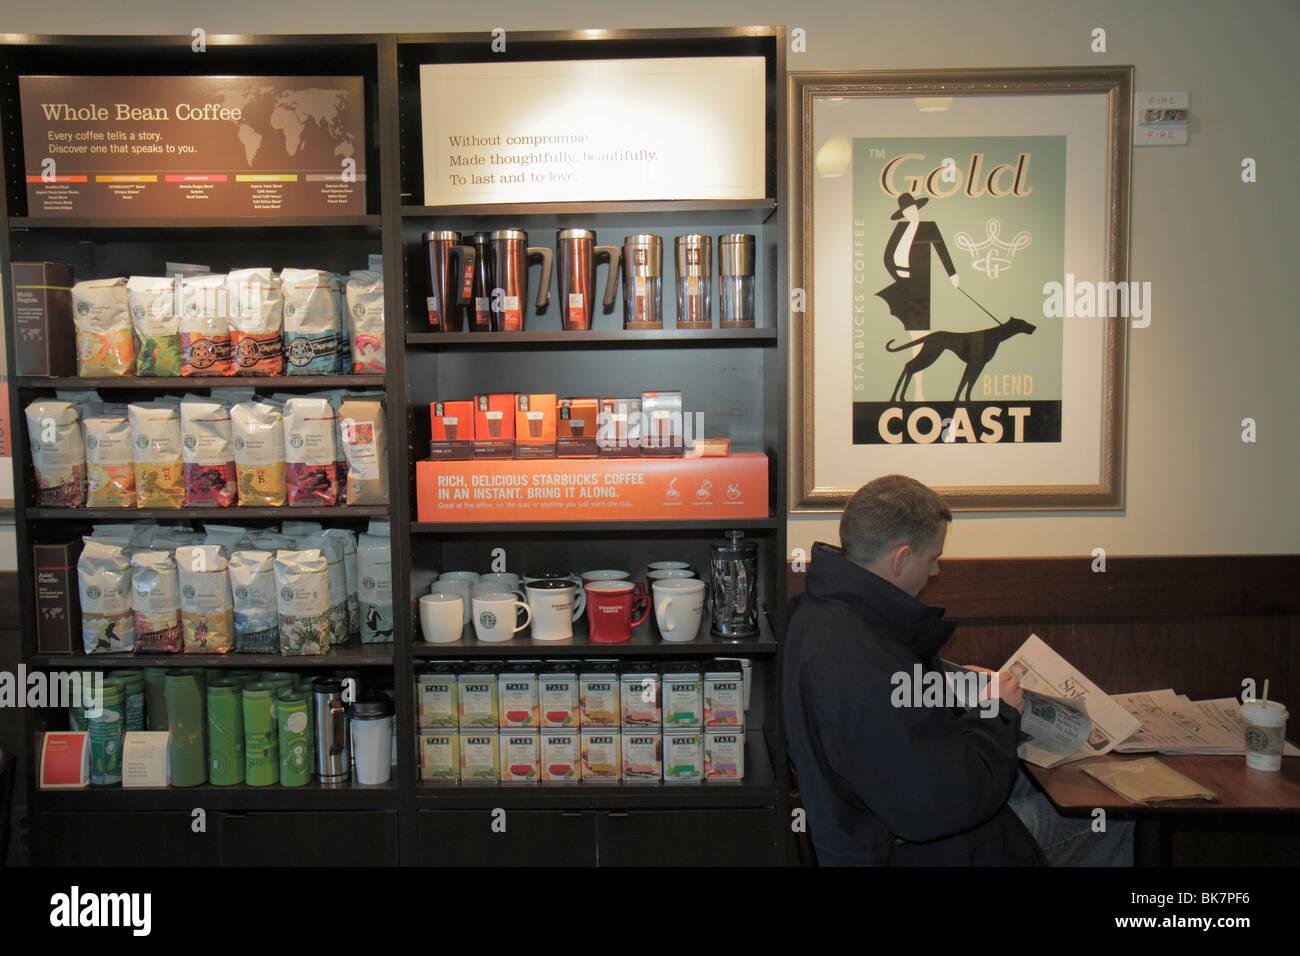 Washington DC Metro Center Starbucks store business company coffee shop packaging mugs merchandise caffeine man - Stock Image